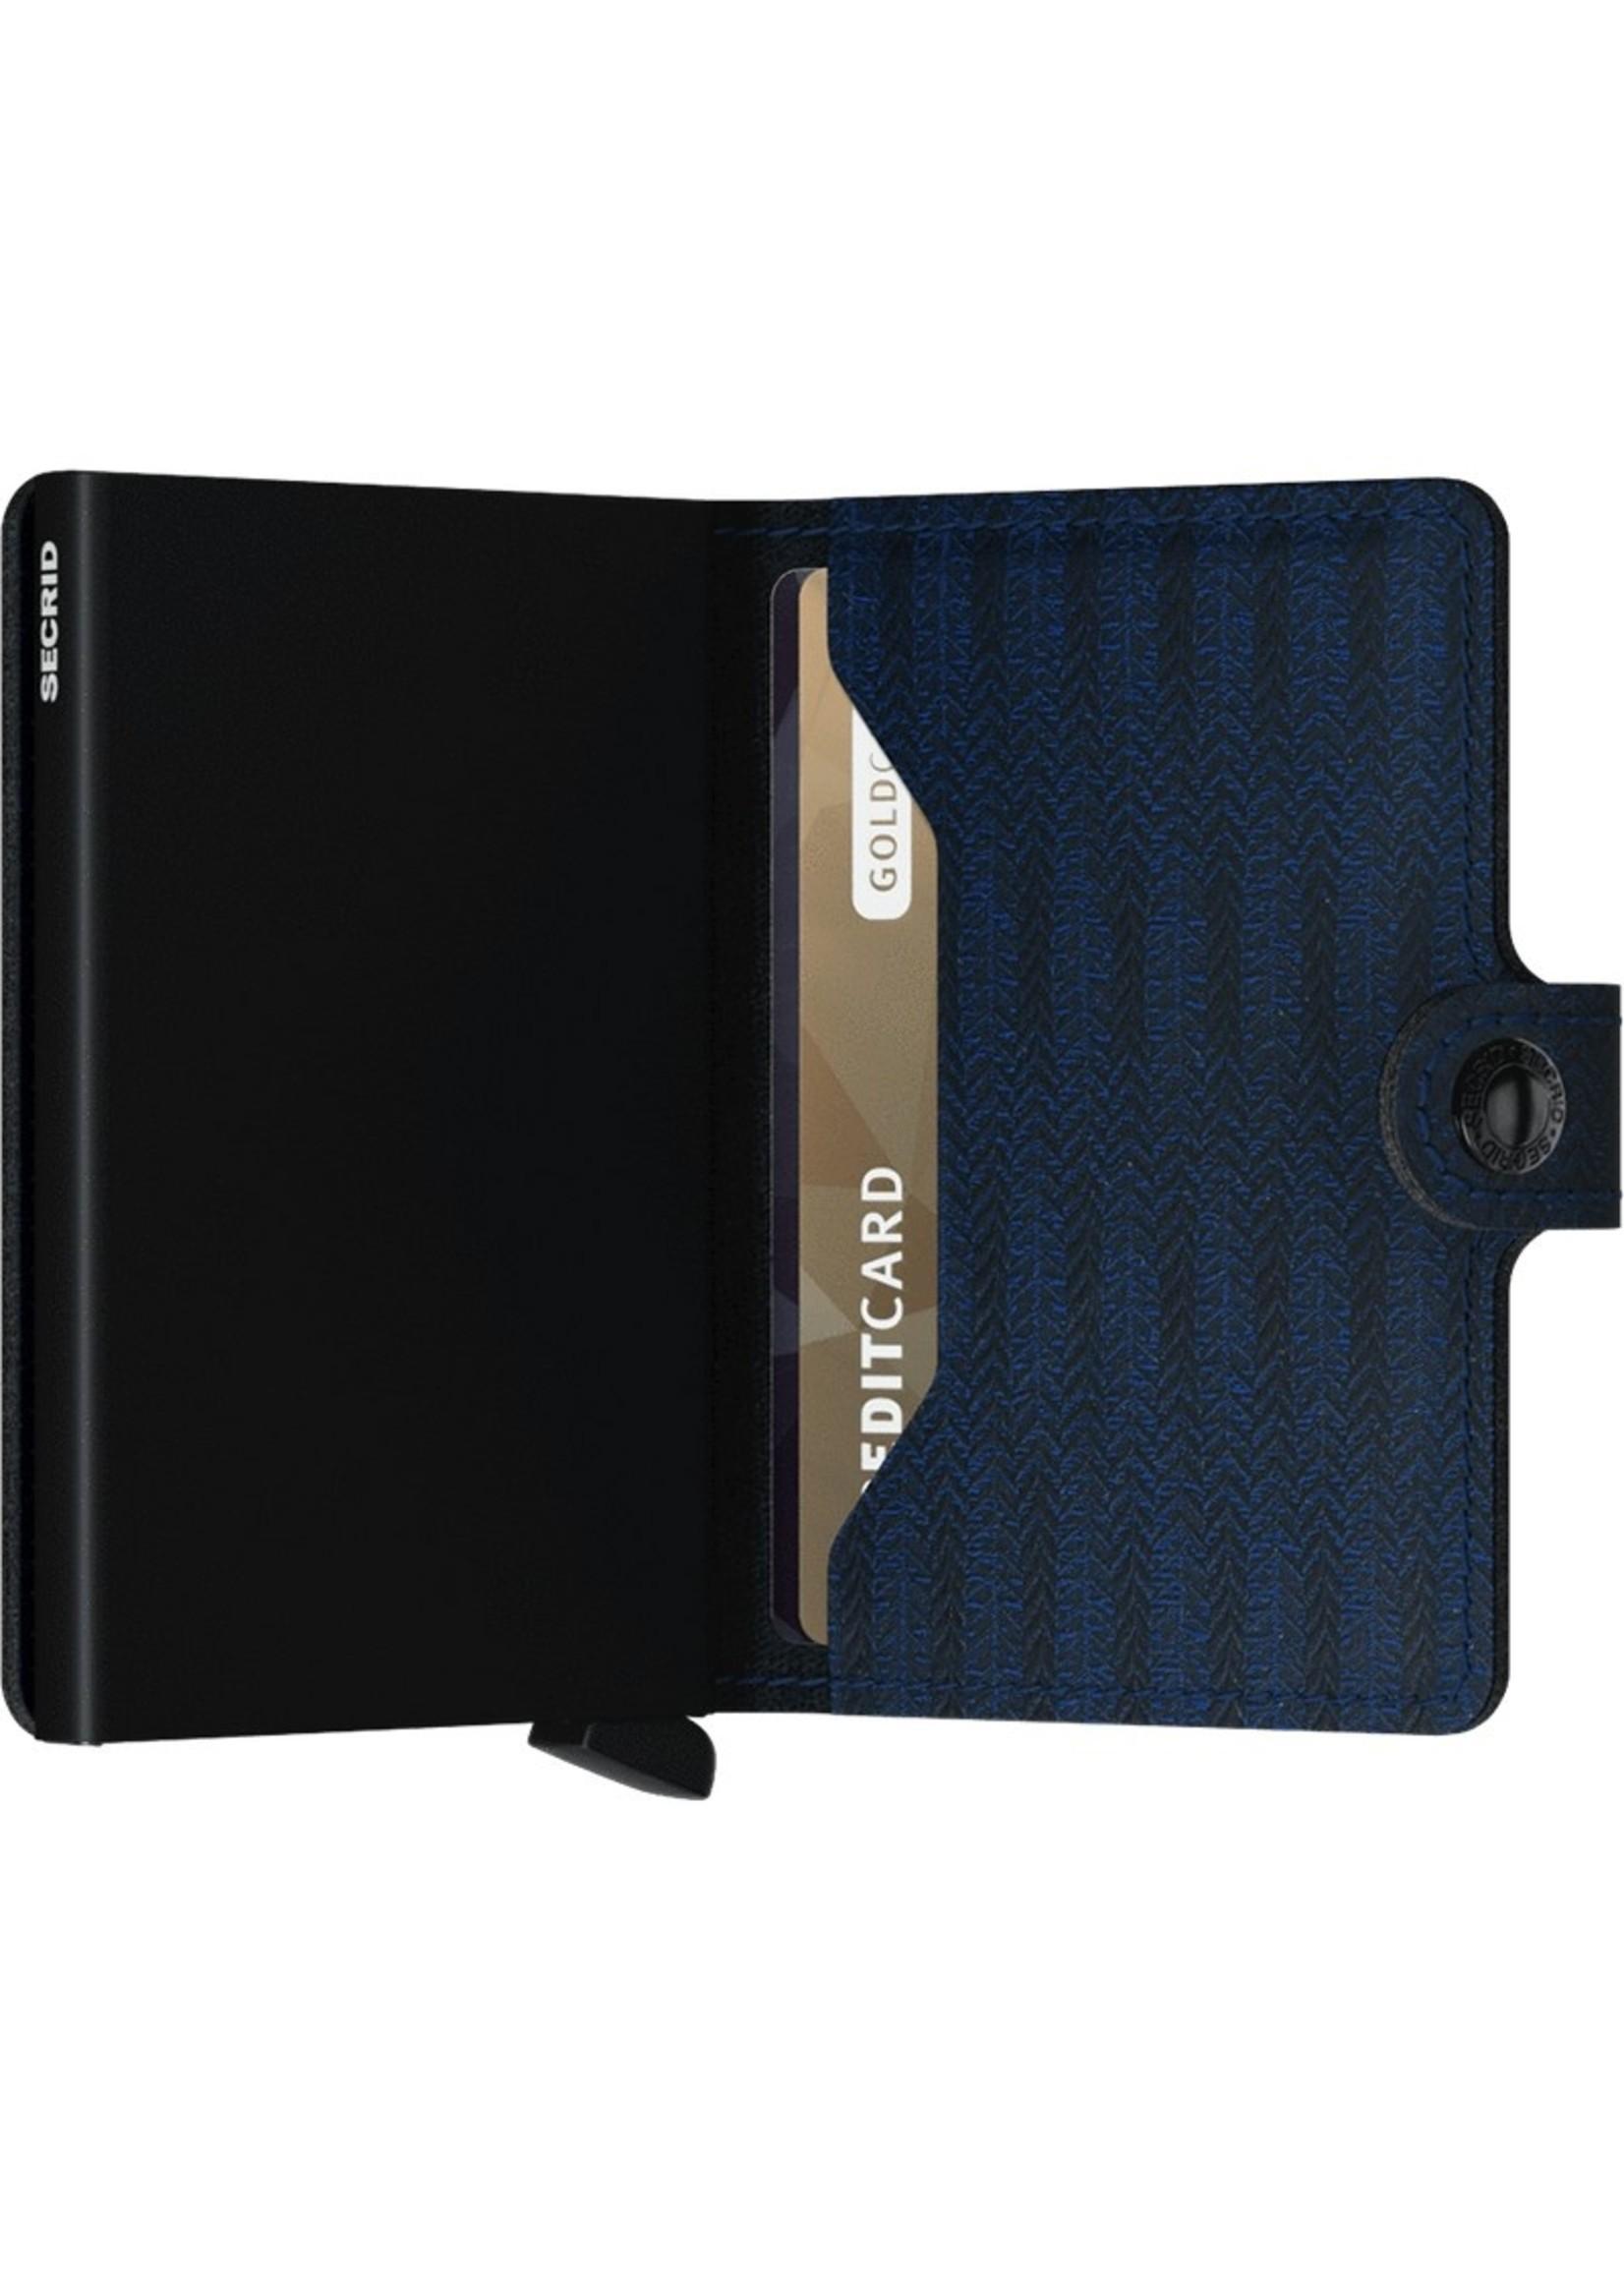 Secrid Wallets Miniwallet Dash Navy